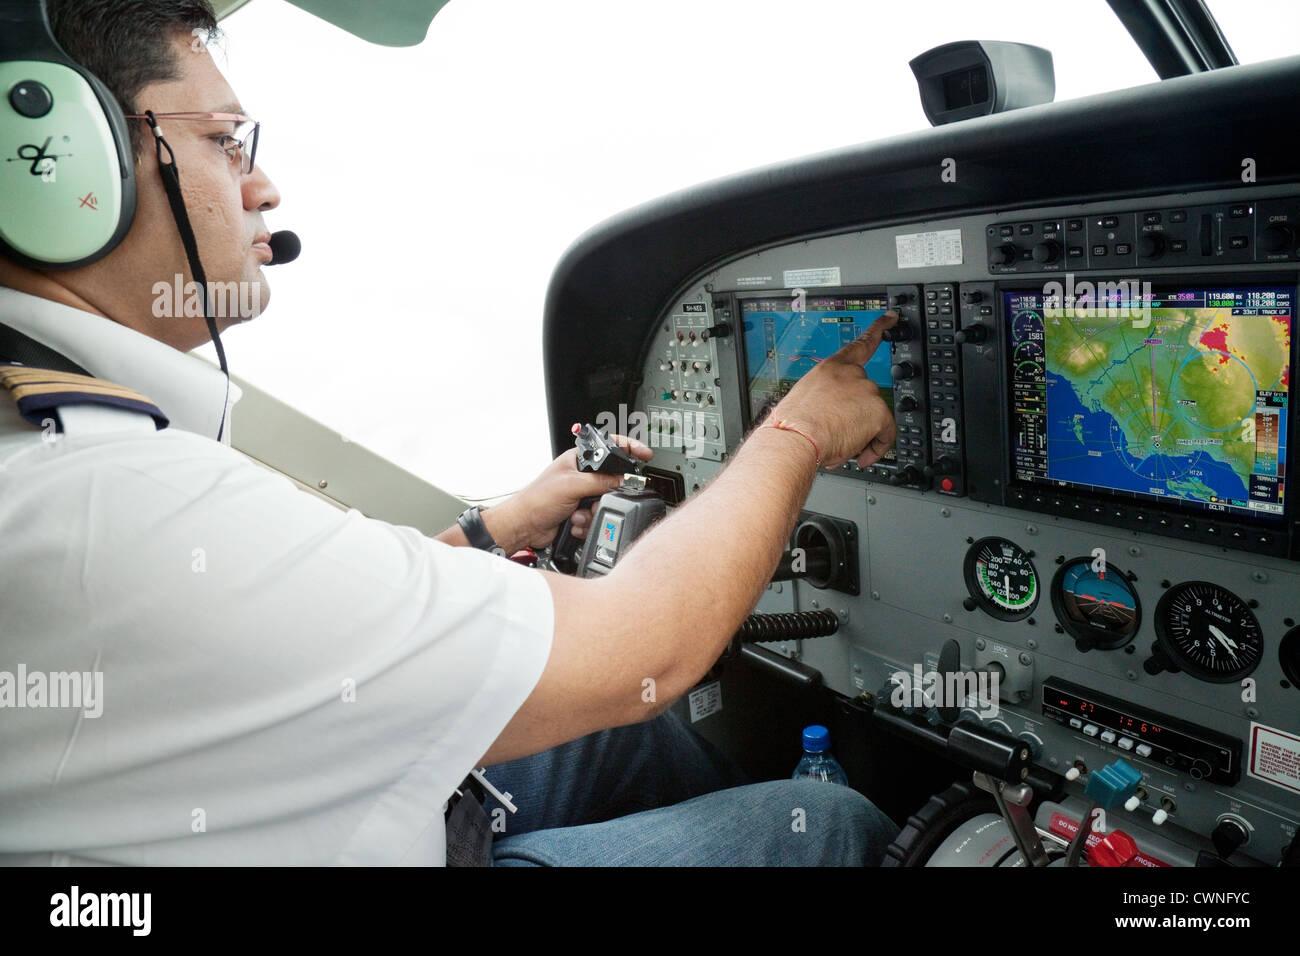 Pilot in the cockpit at the controls of a Cessna Caravan light aircraft plane, Tanzania, Africa - Stock Image